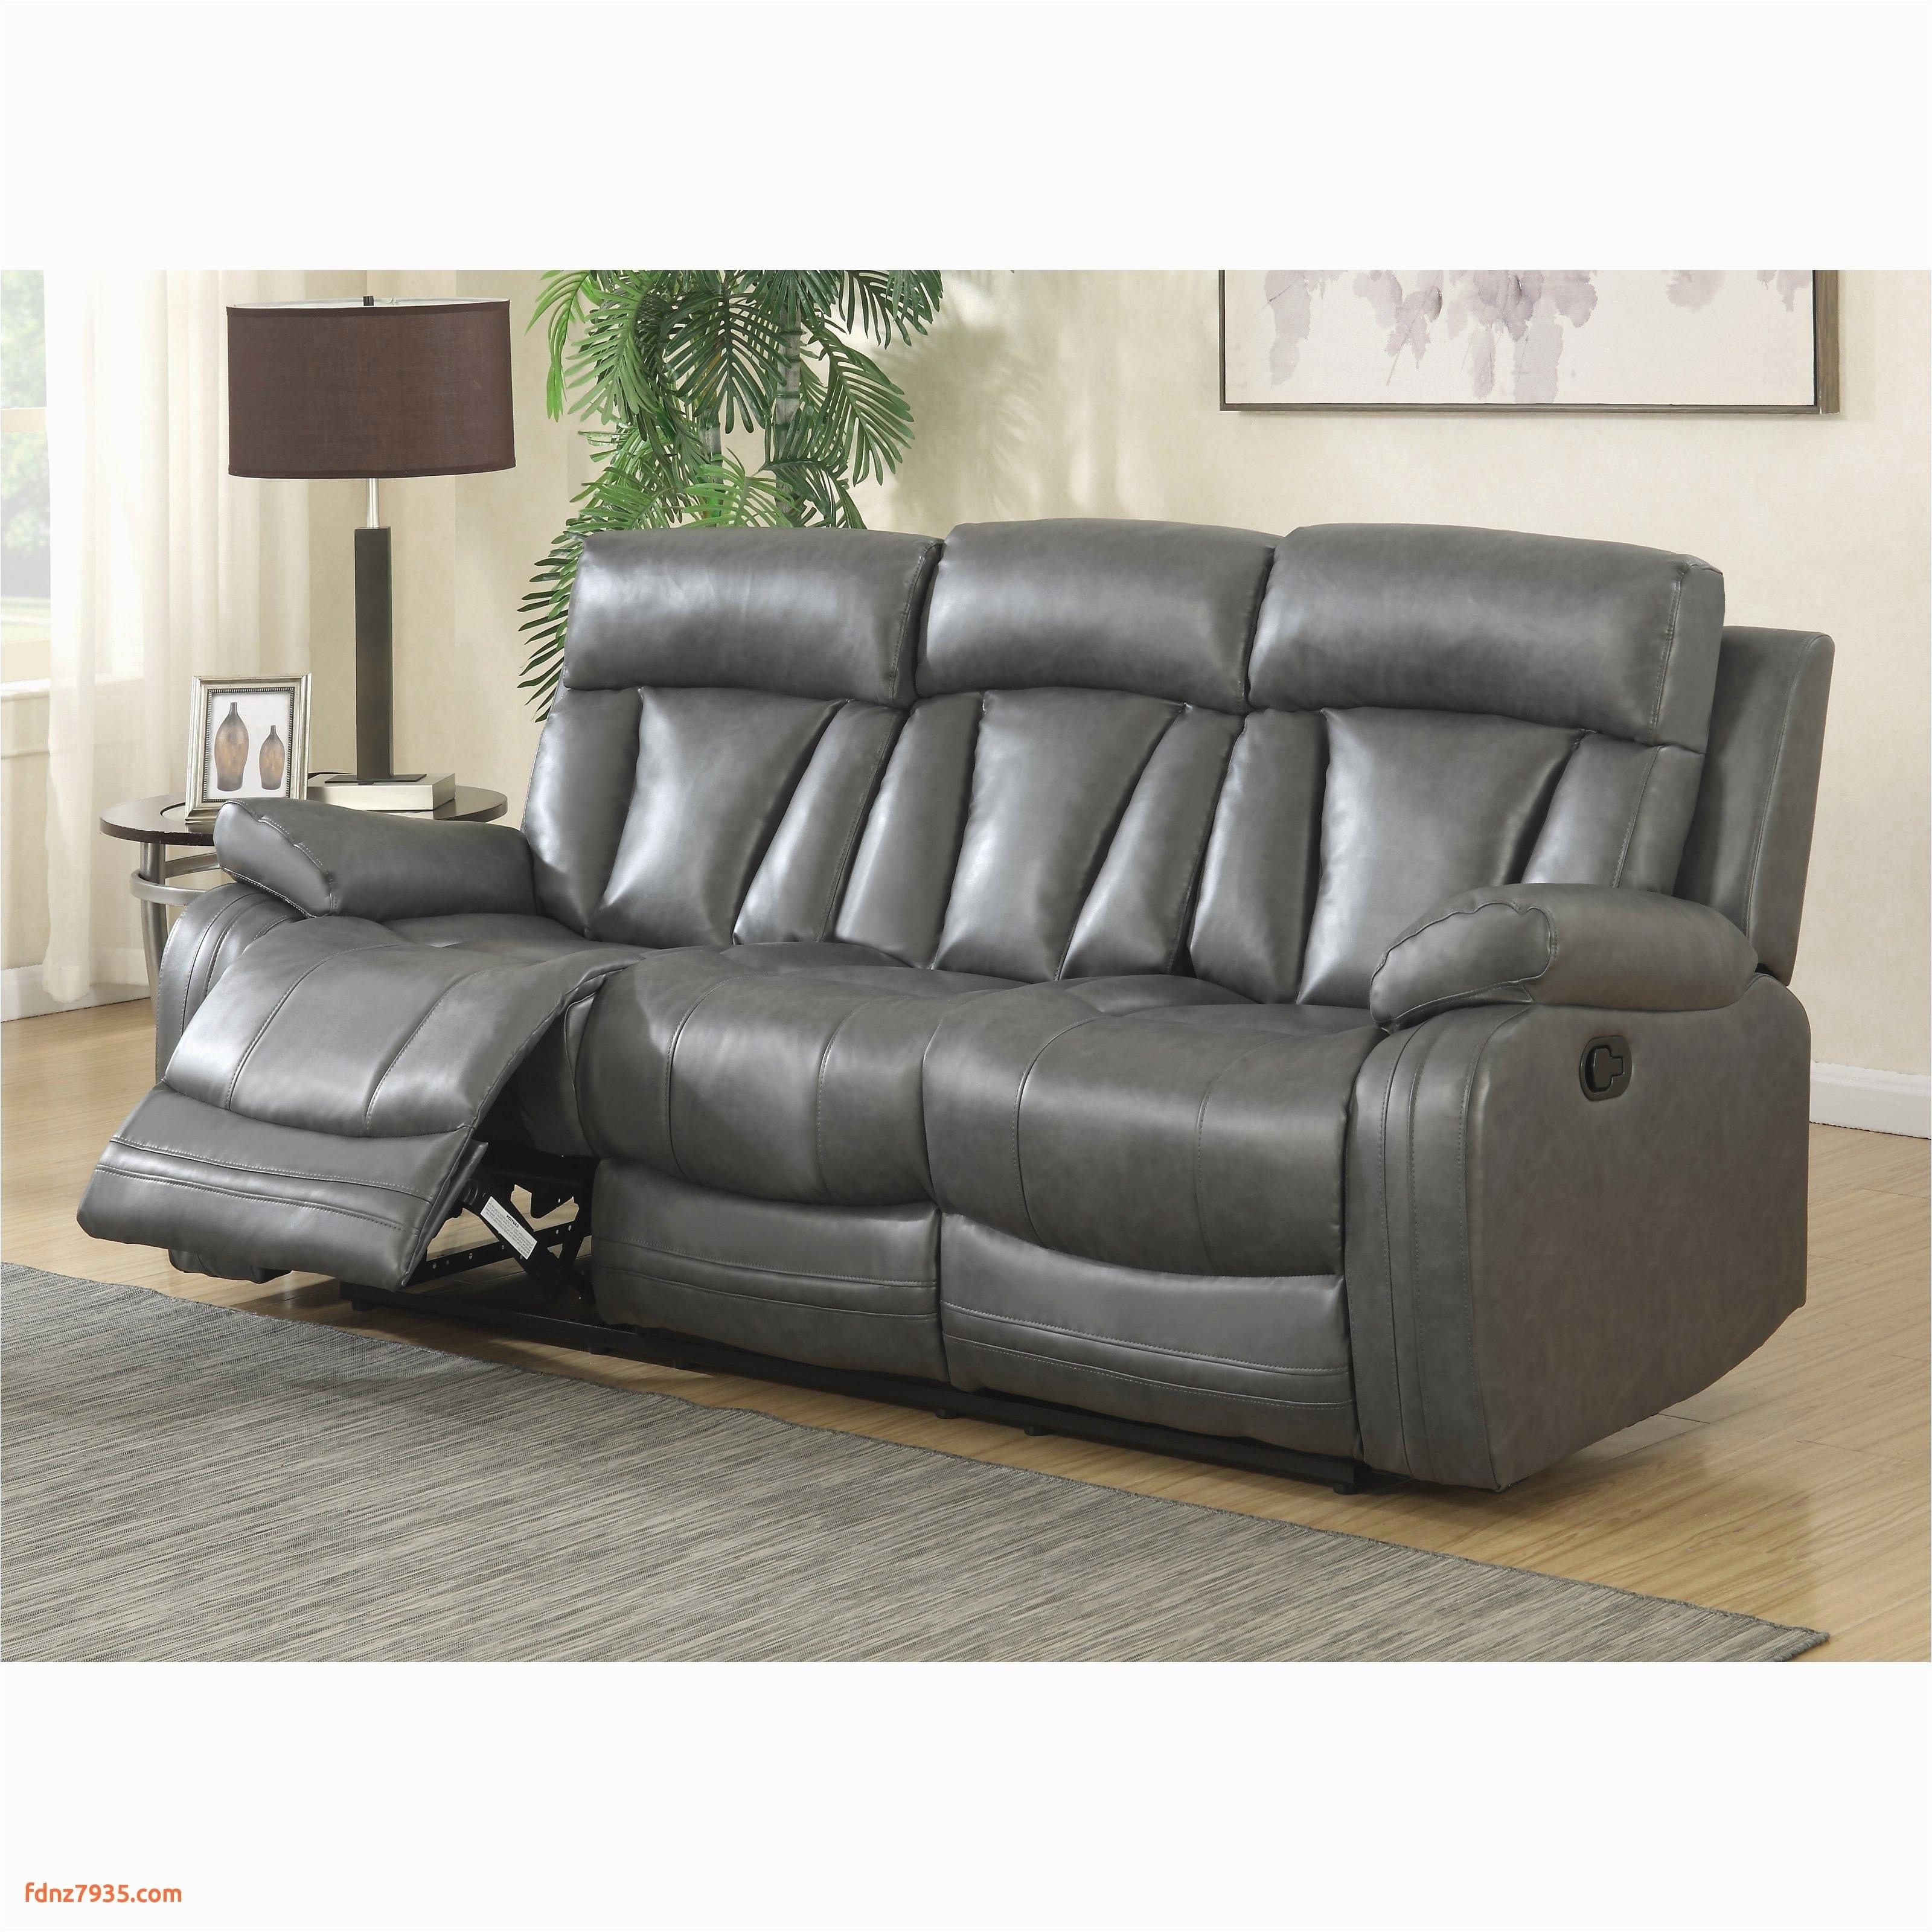 Big Bobs Furniture 22 Fresh Of Bobs Furniture sofa Cama Image Home Furniture Ideas